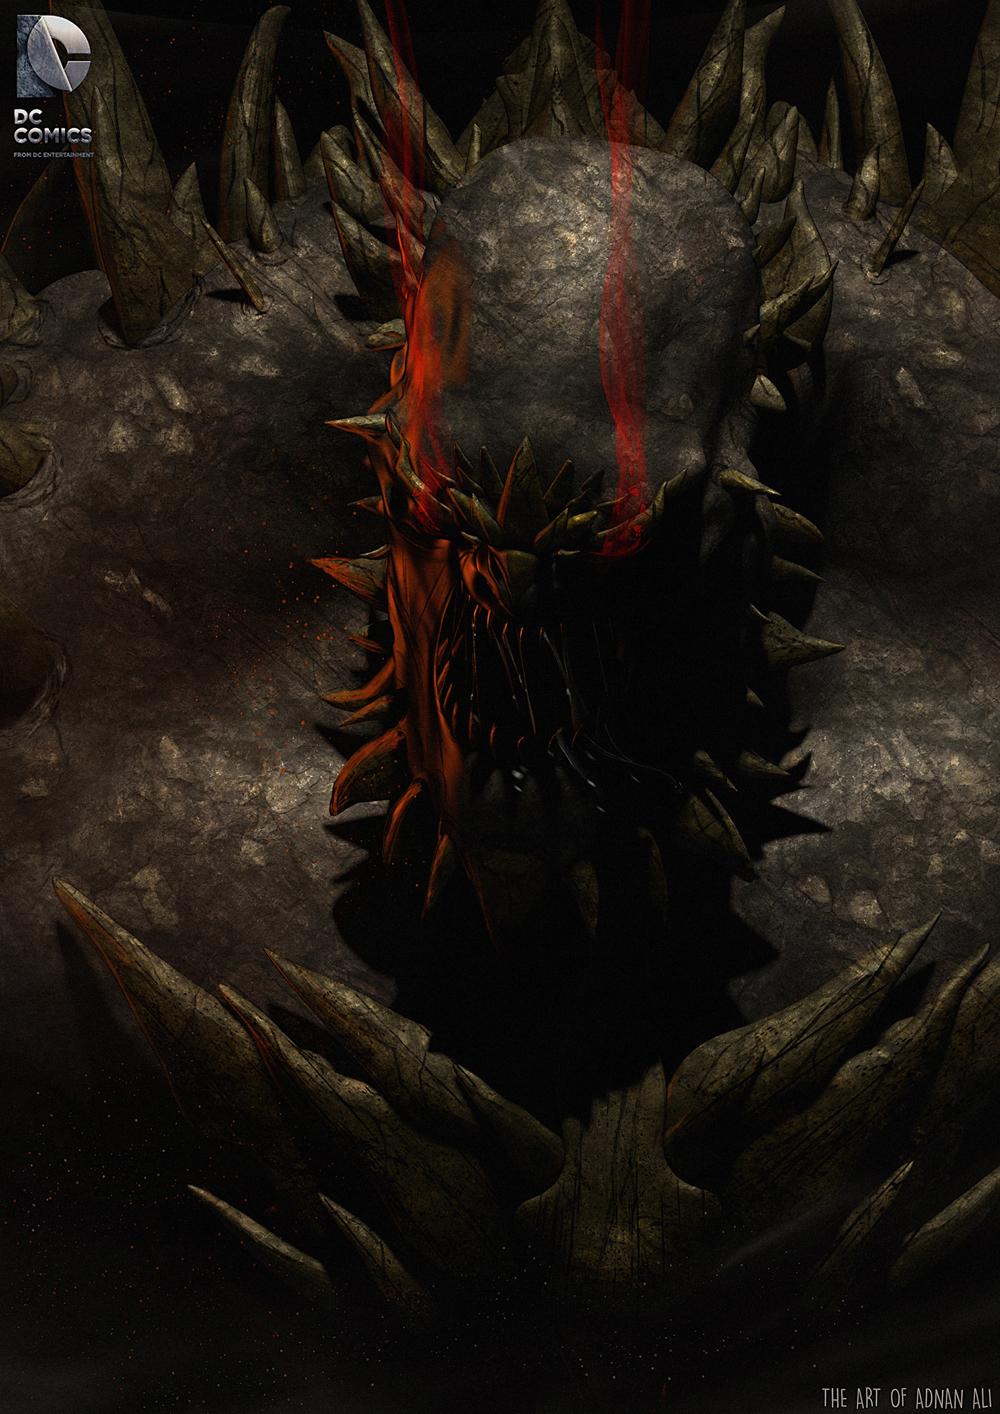 Doomsday By Addu Fan Art 3d Cgsociety